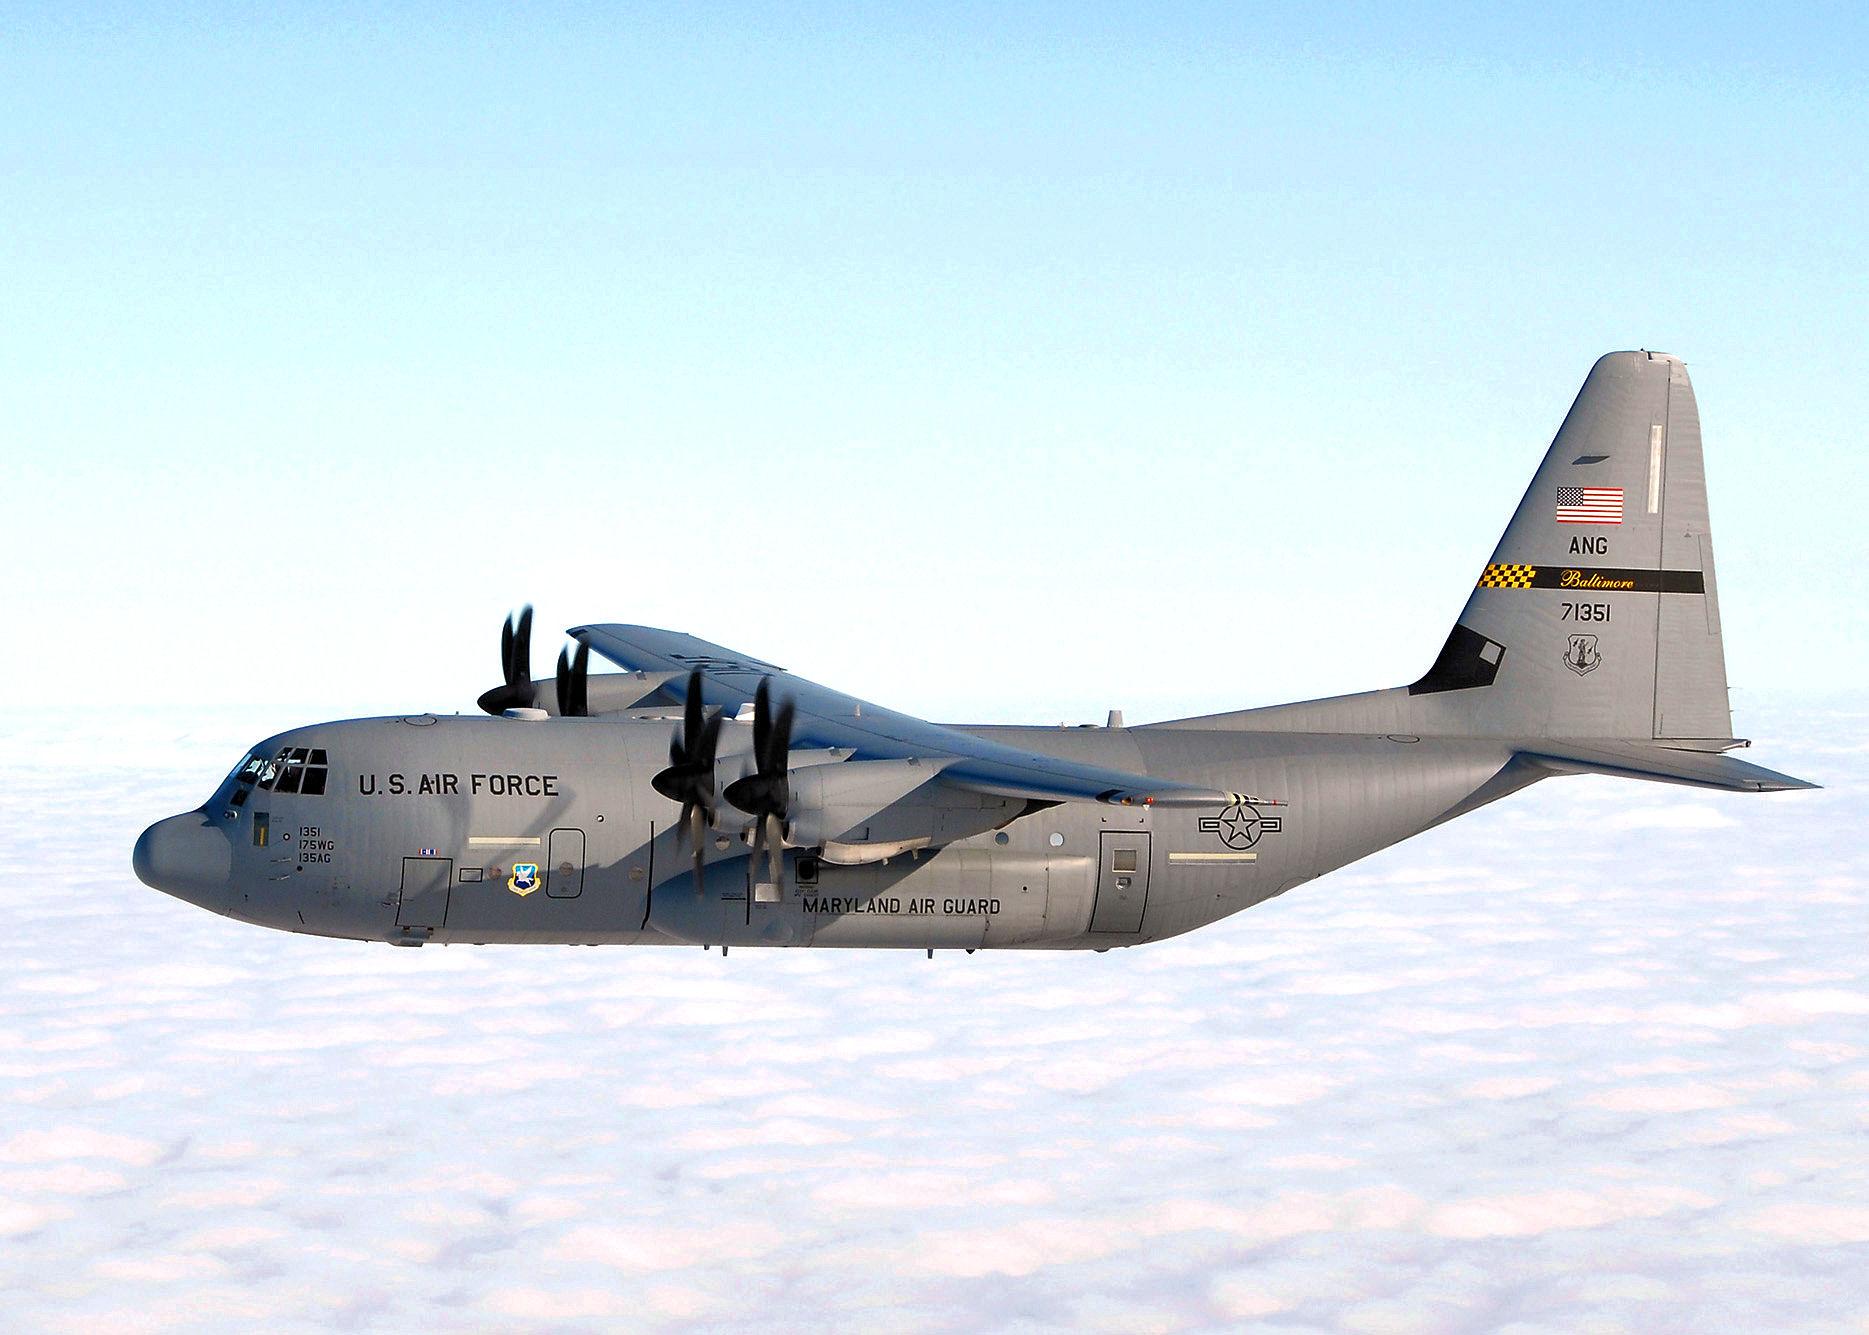 File:175th Wing - C-130 Hercules Warfield Air National Guard Base Maryland.